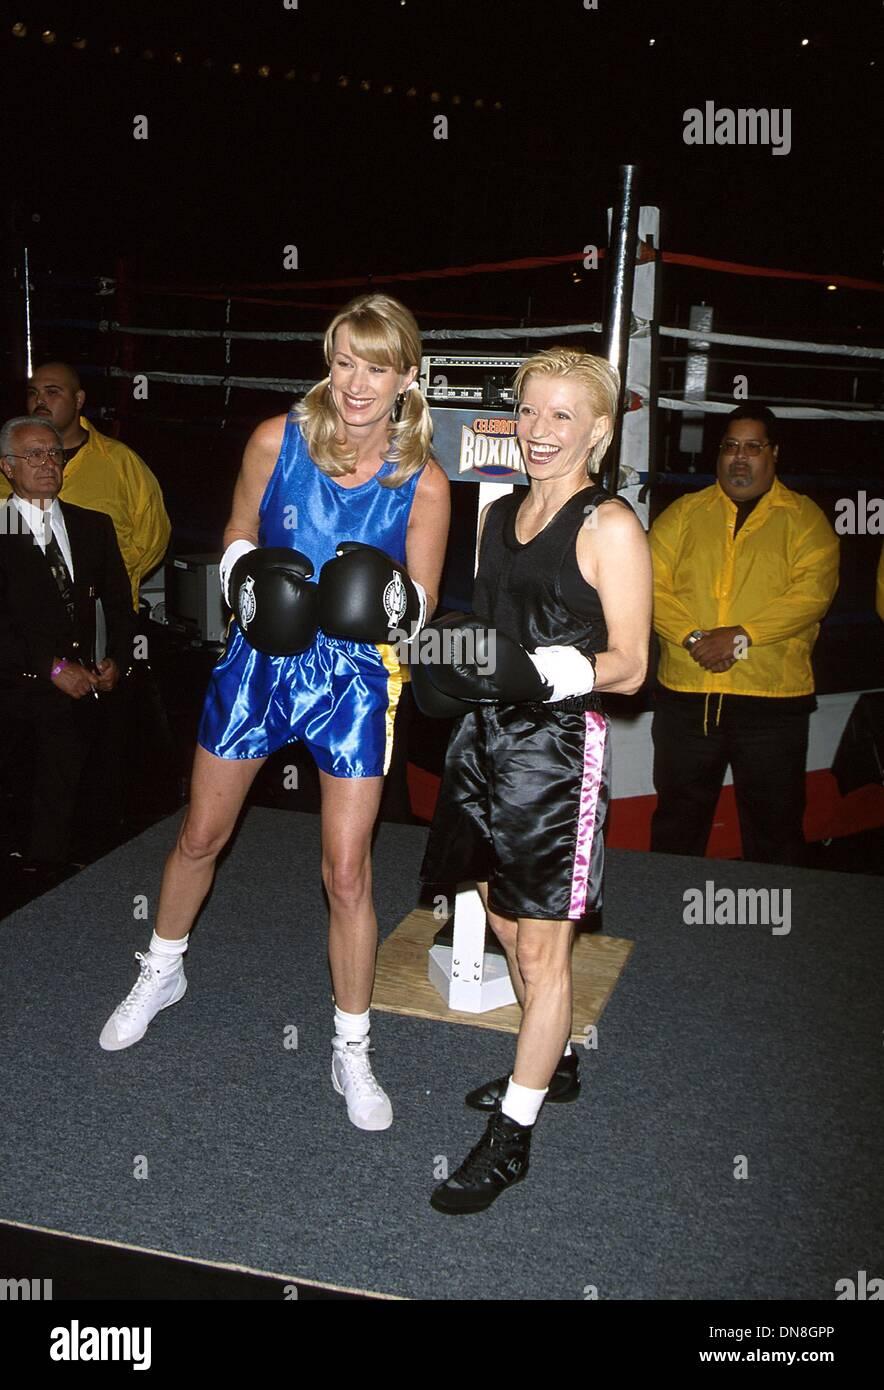 Celebrity Boxing - Wikipedia